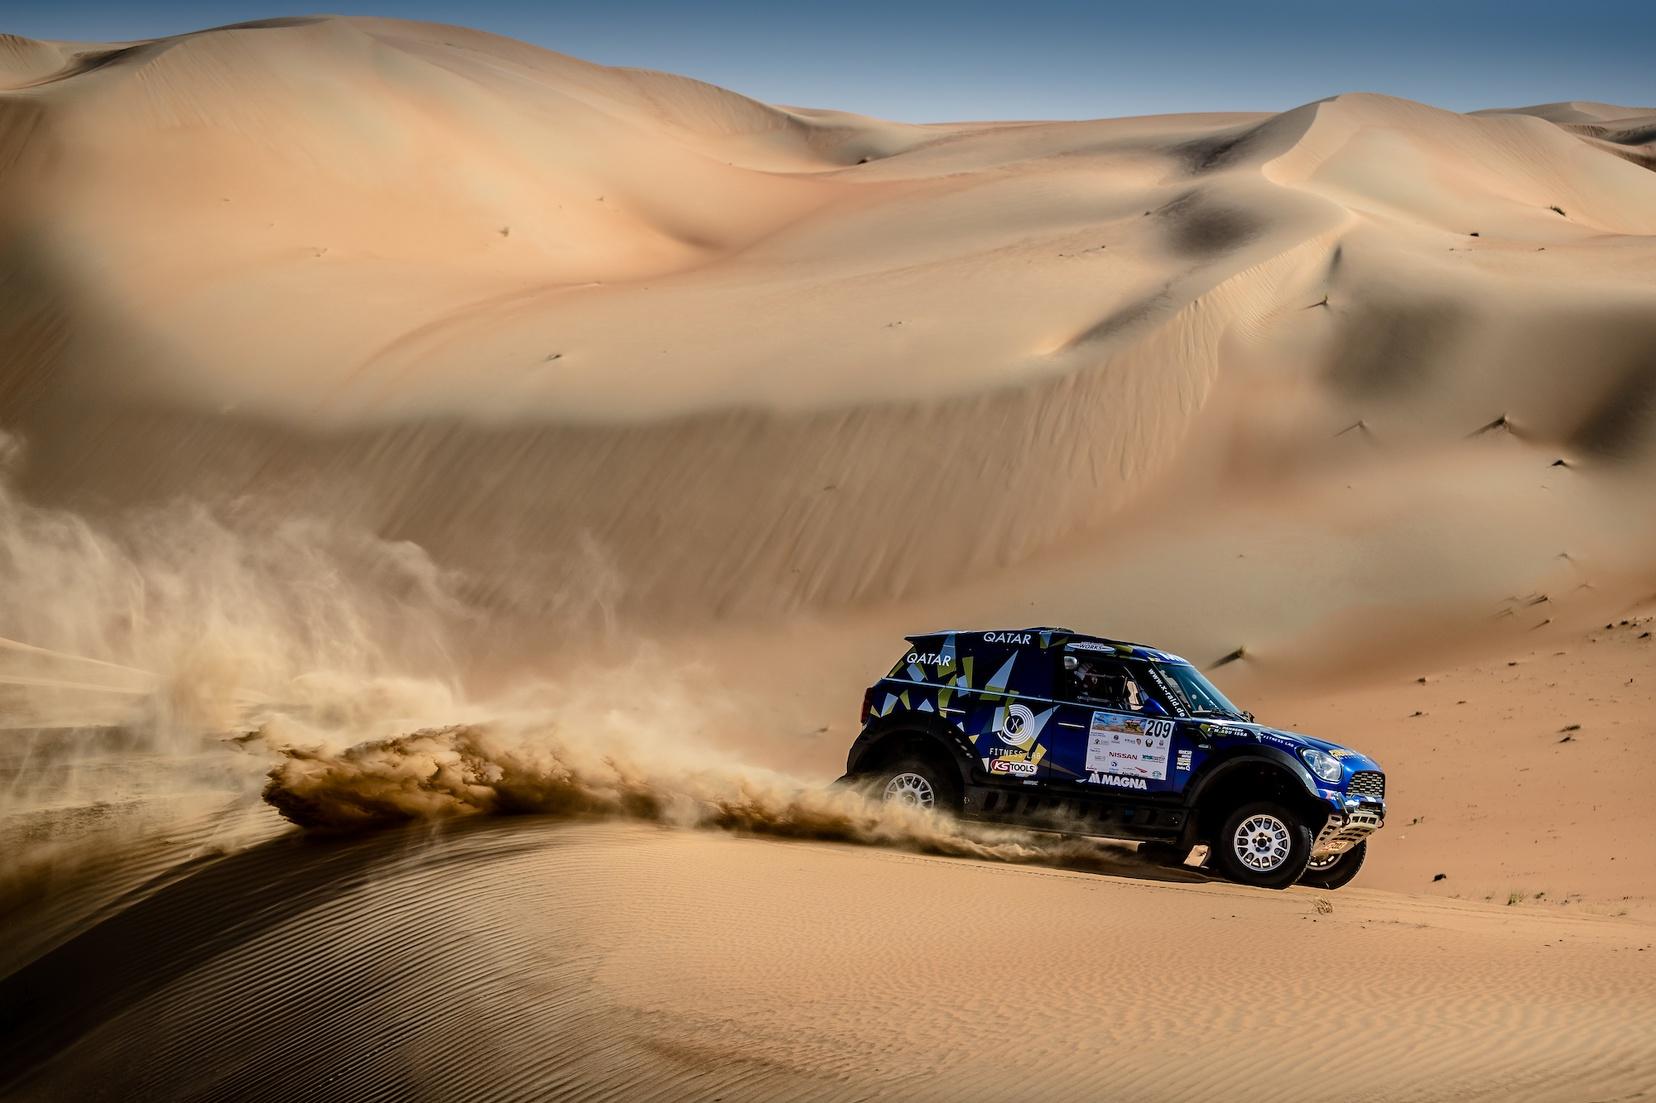 2017 Abu Dhabi Desert Challenge - Mohamed Abu Issa - Xavier Panseri - MINI ALL4 Racing - X-raid Team #209